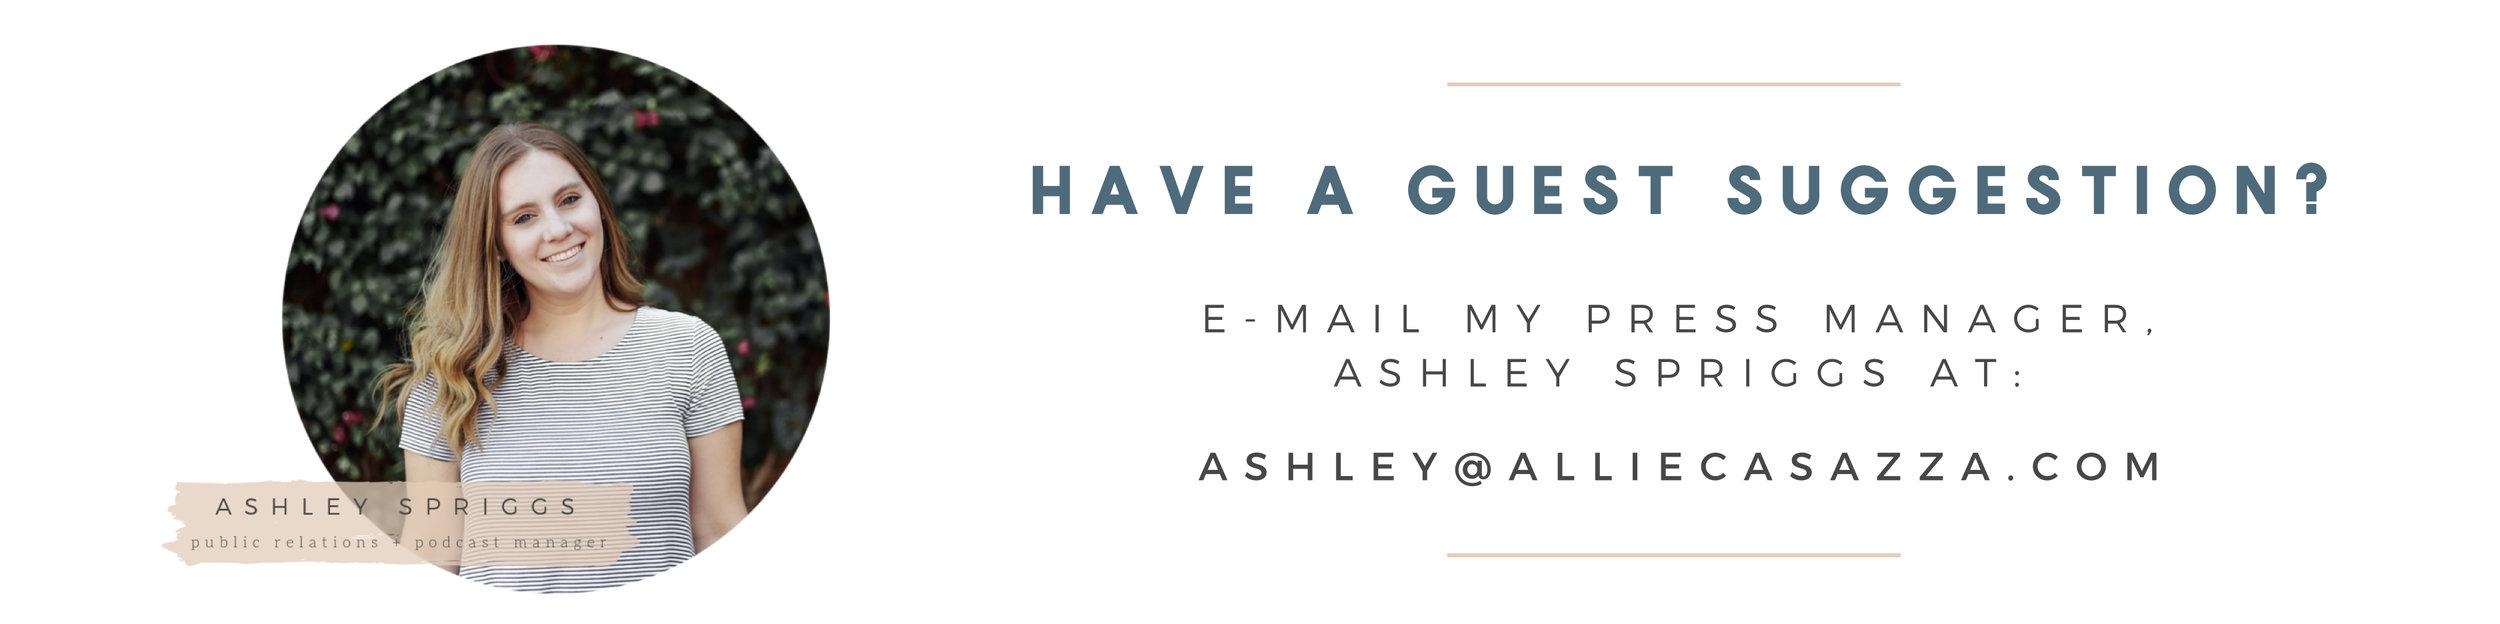 Ashley Contact.jpg